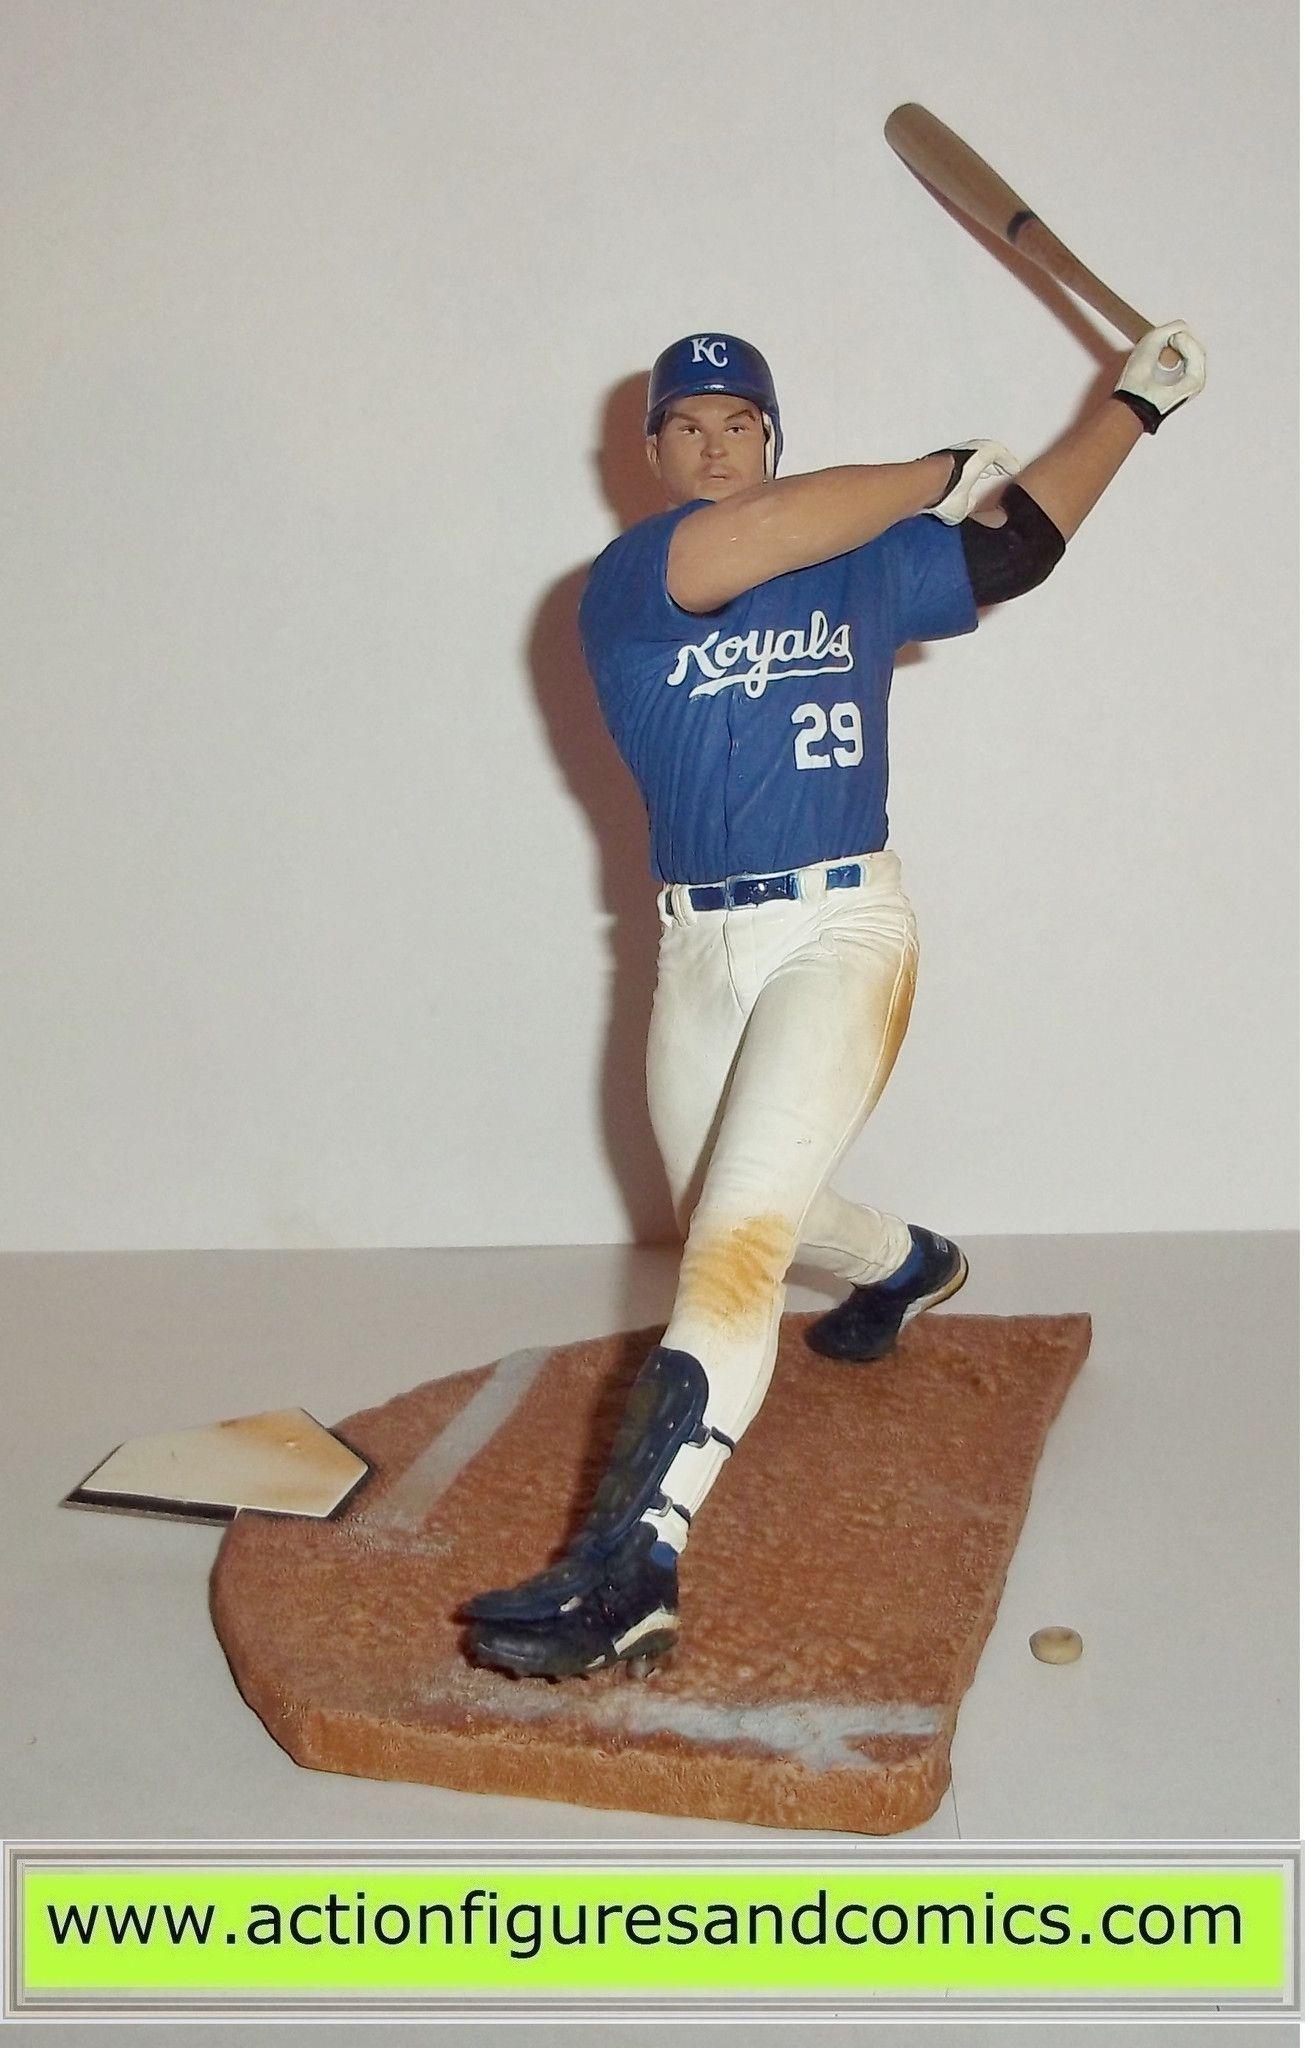 Mcfarlane Sports Action Figures Mike Sweeney Kc Royals Sportspick Baseball Toys Baseball Toys Action Figures Kc Royals